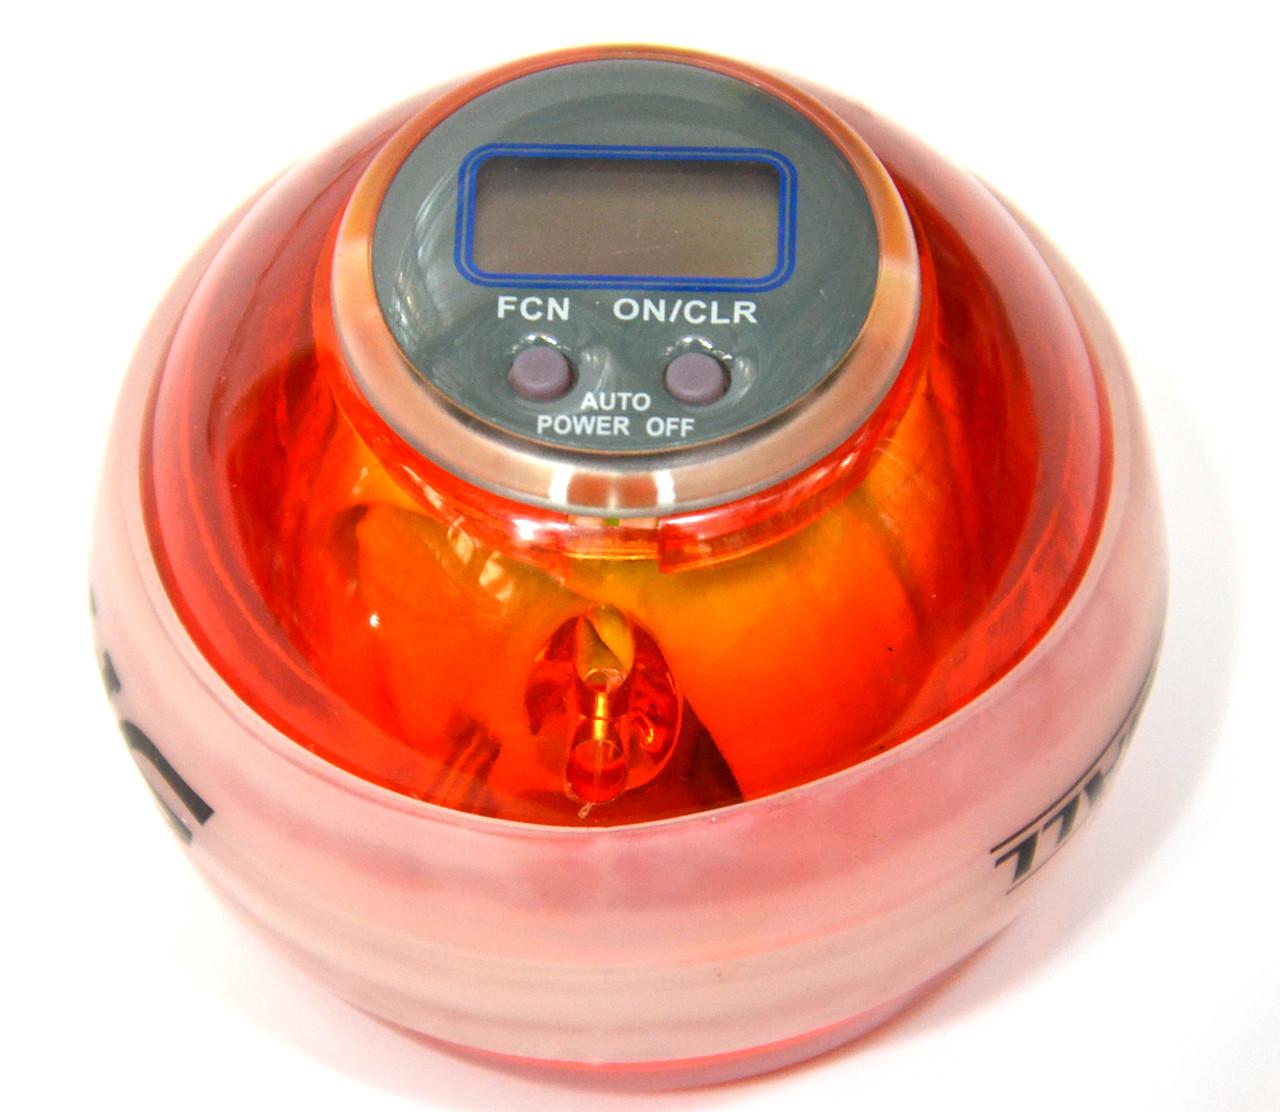 Тренажёр кистевой WRIST BALL с счетчиком оборотов